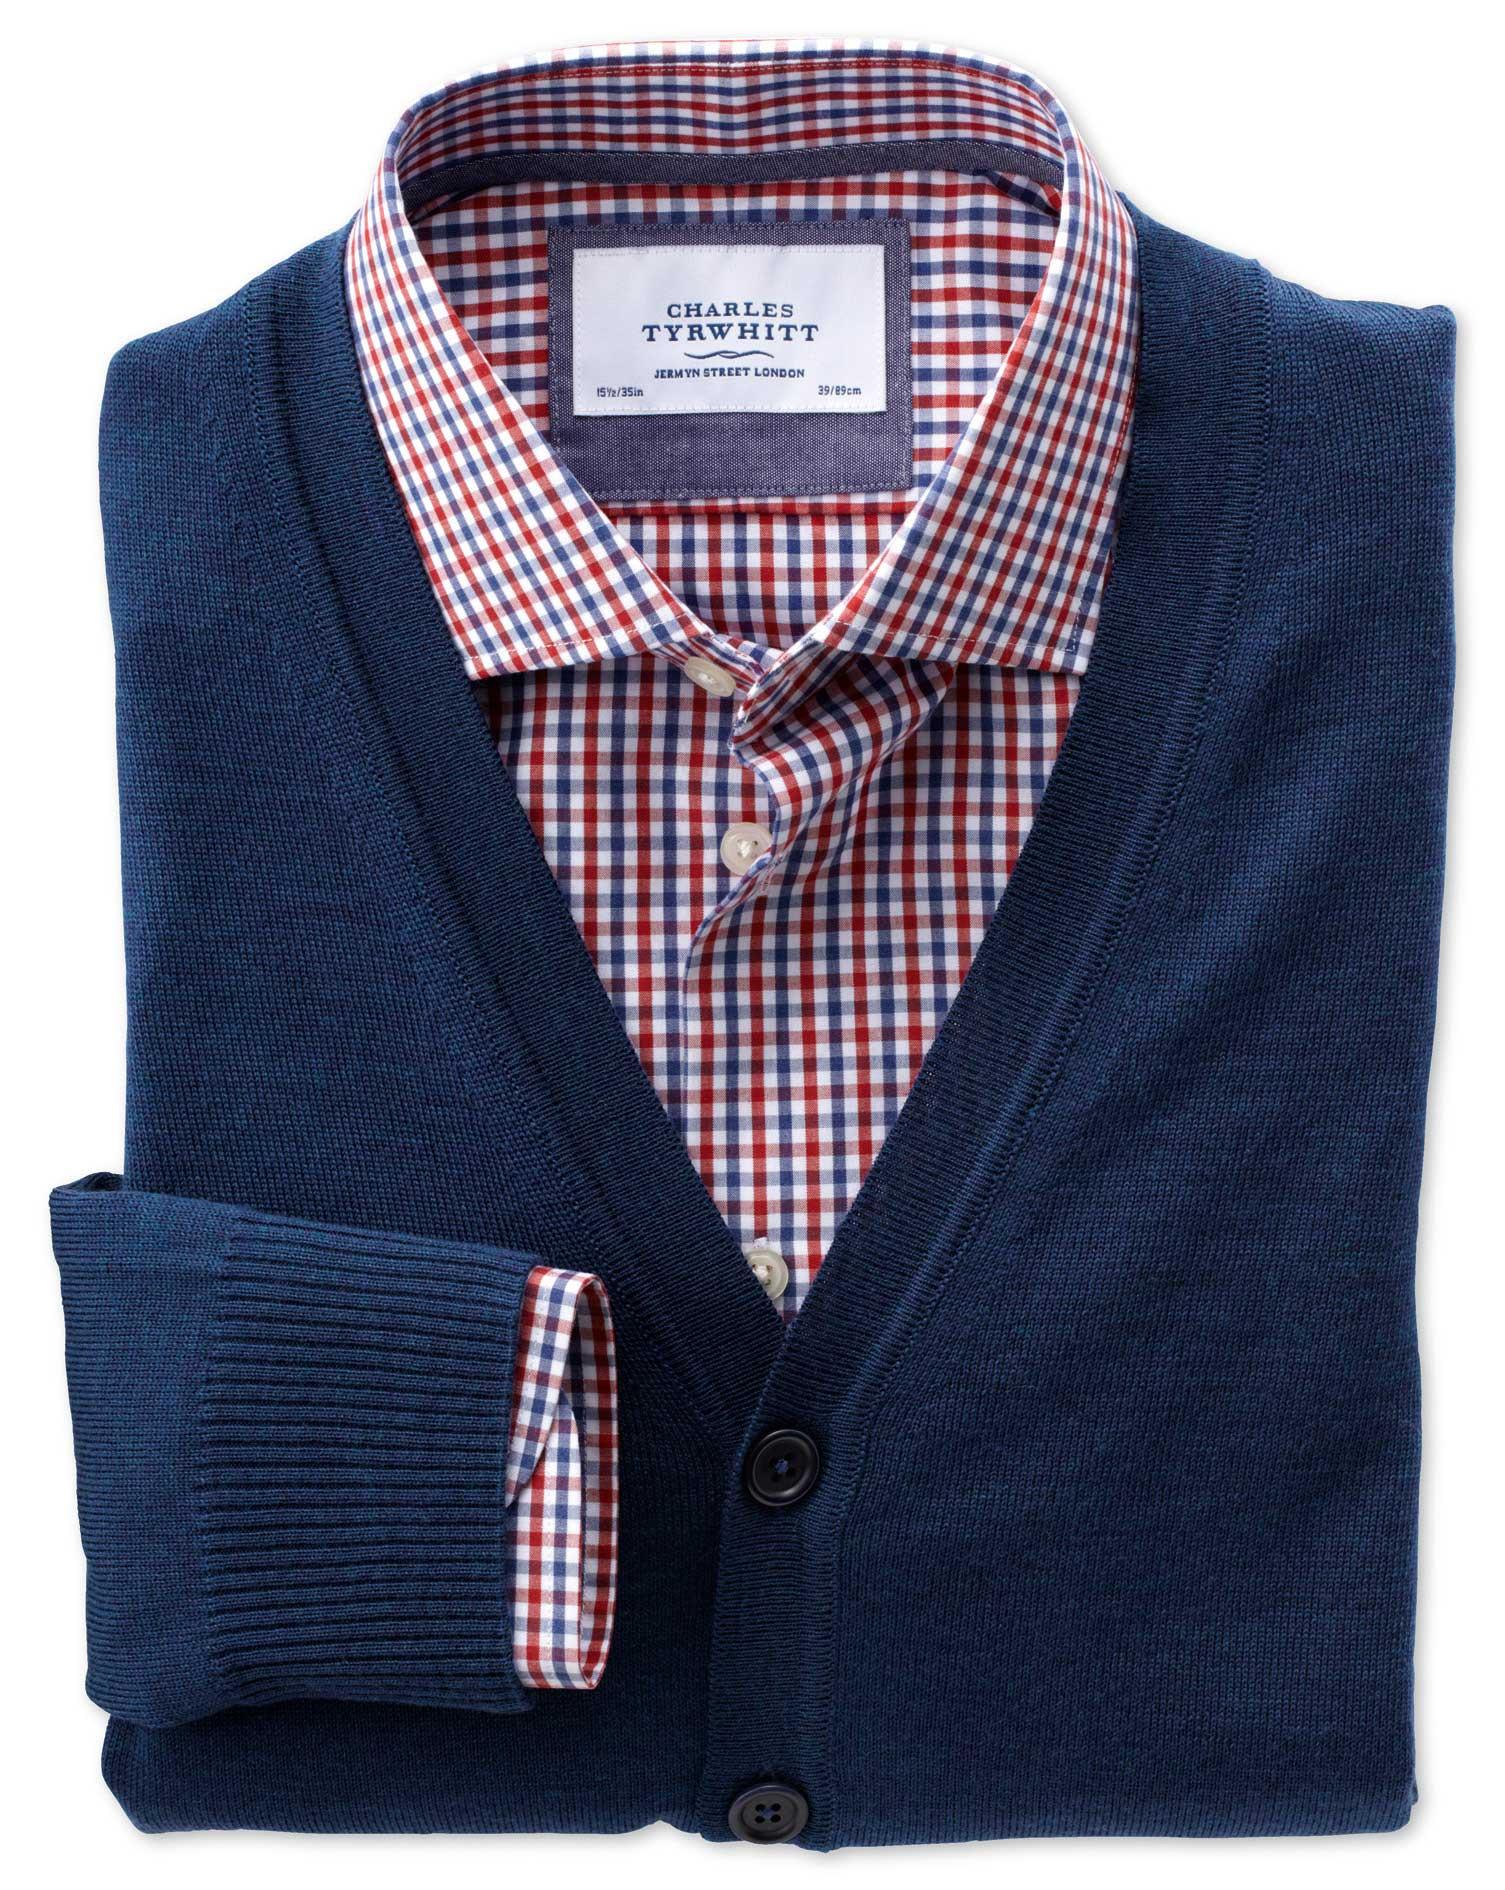 Mid Blue Merino Wool Cardigan Size XXXL by Charles Tyrwhitt